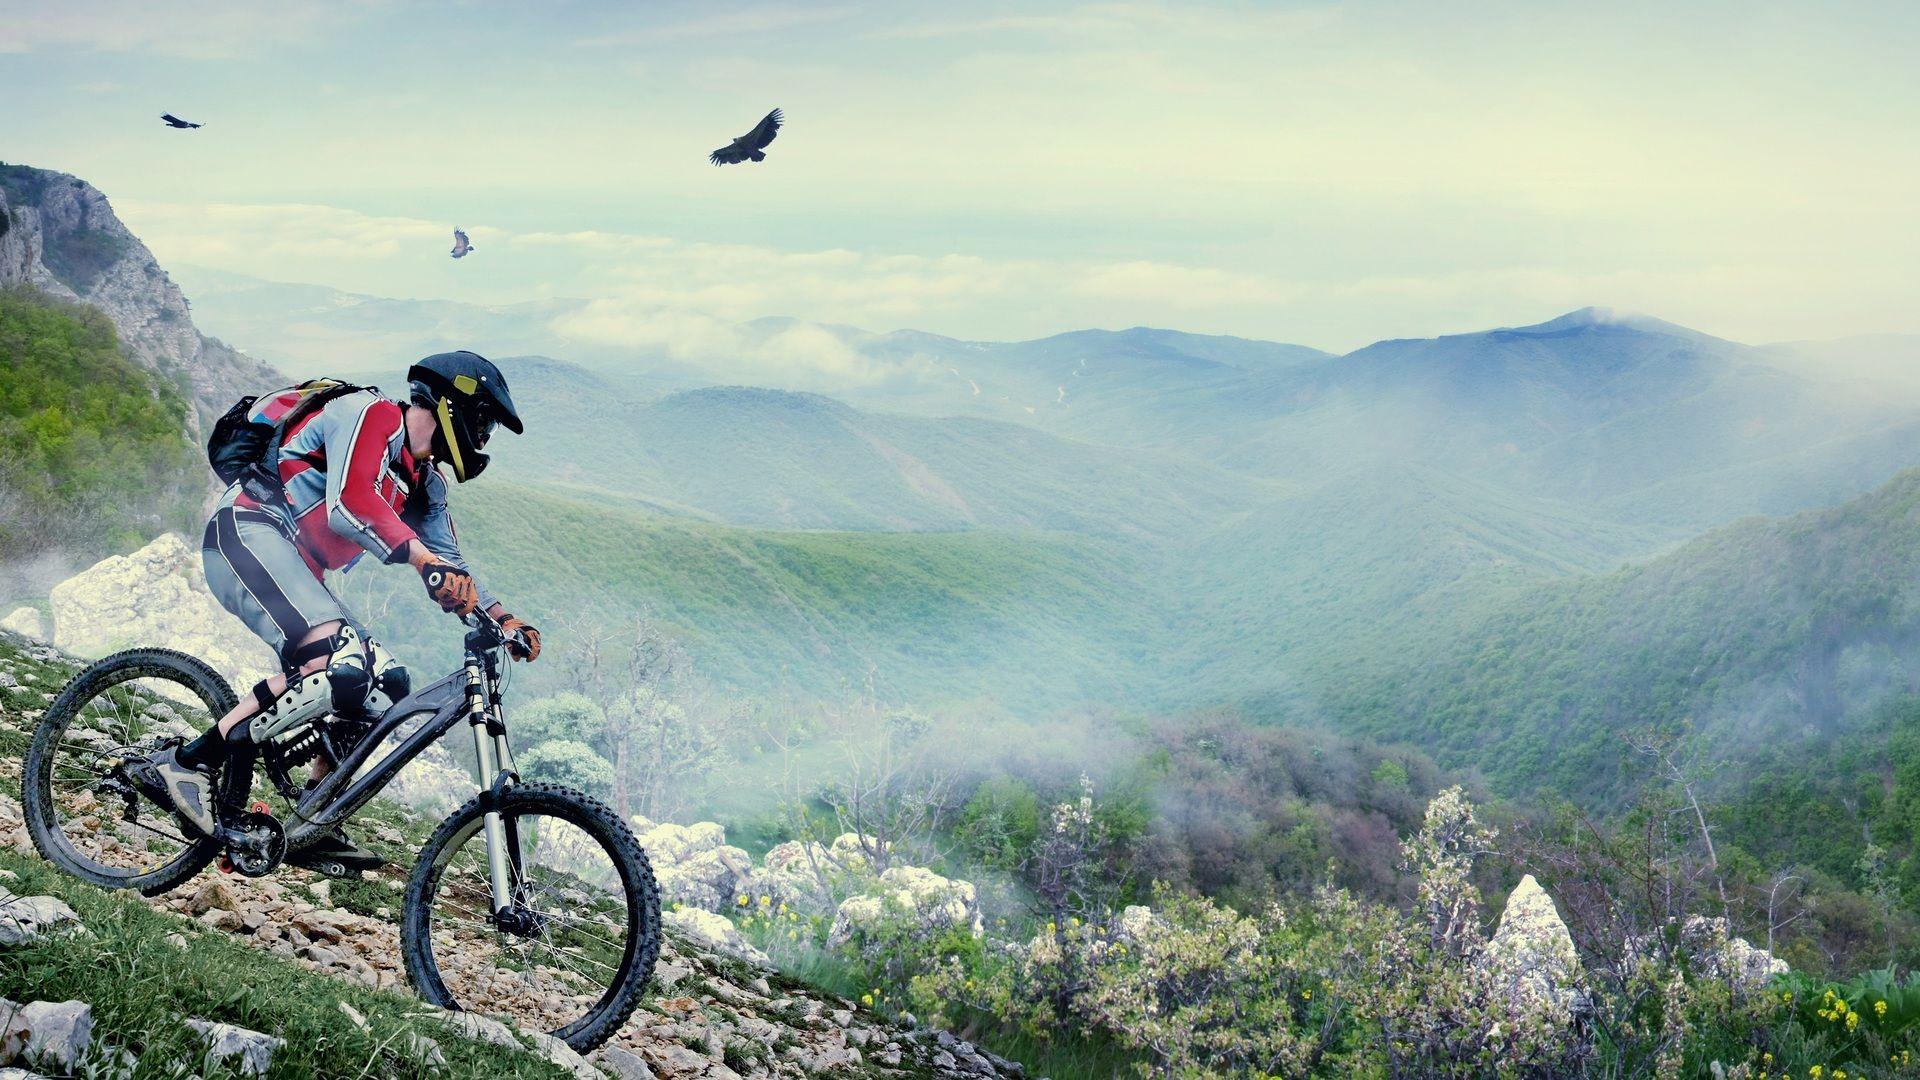 Mountain Bike full hd wallpaper